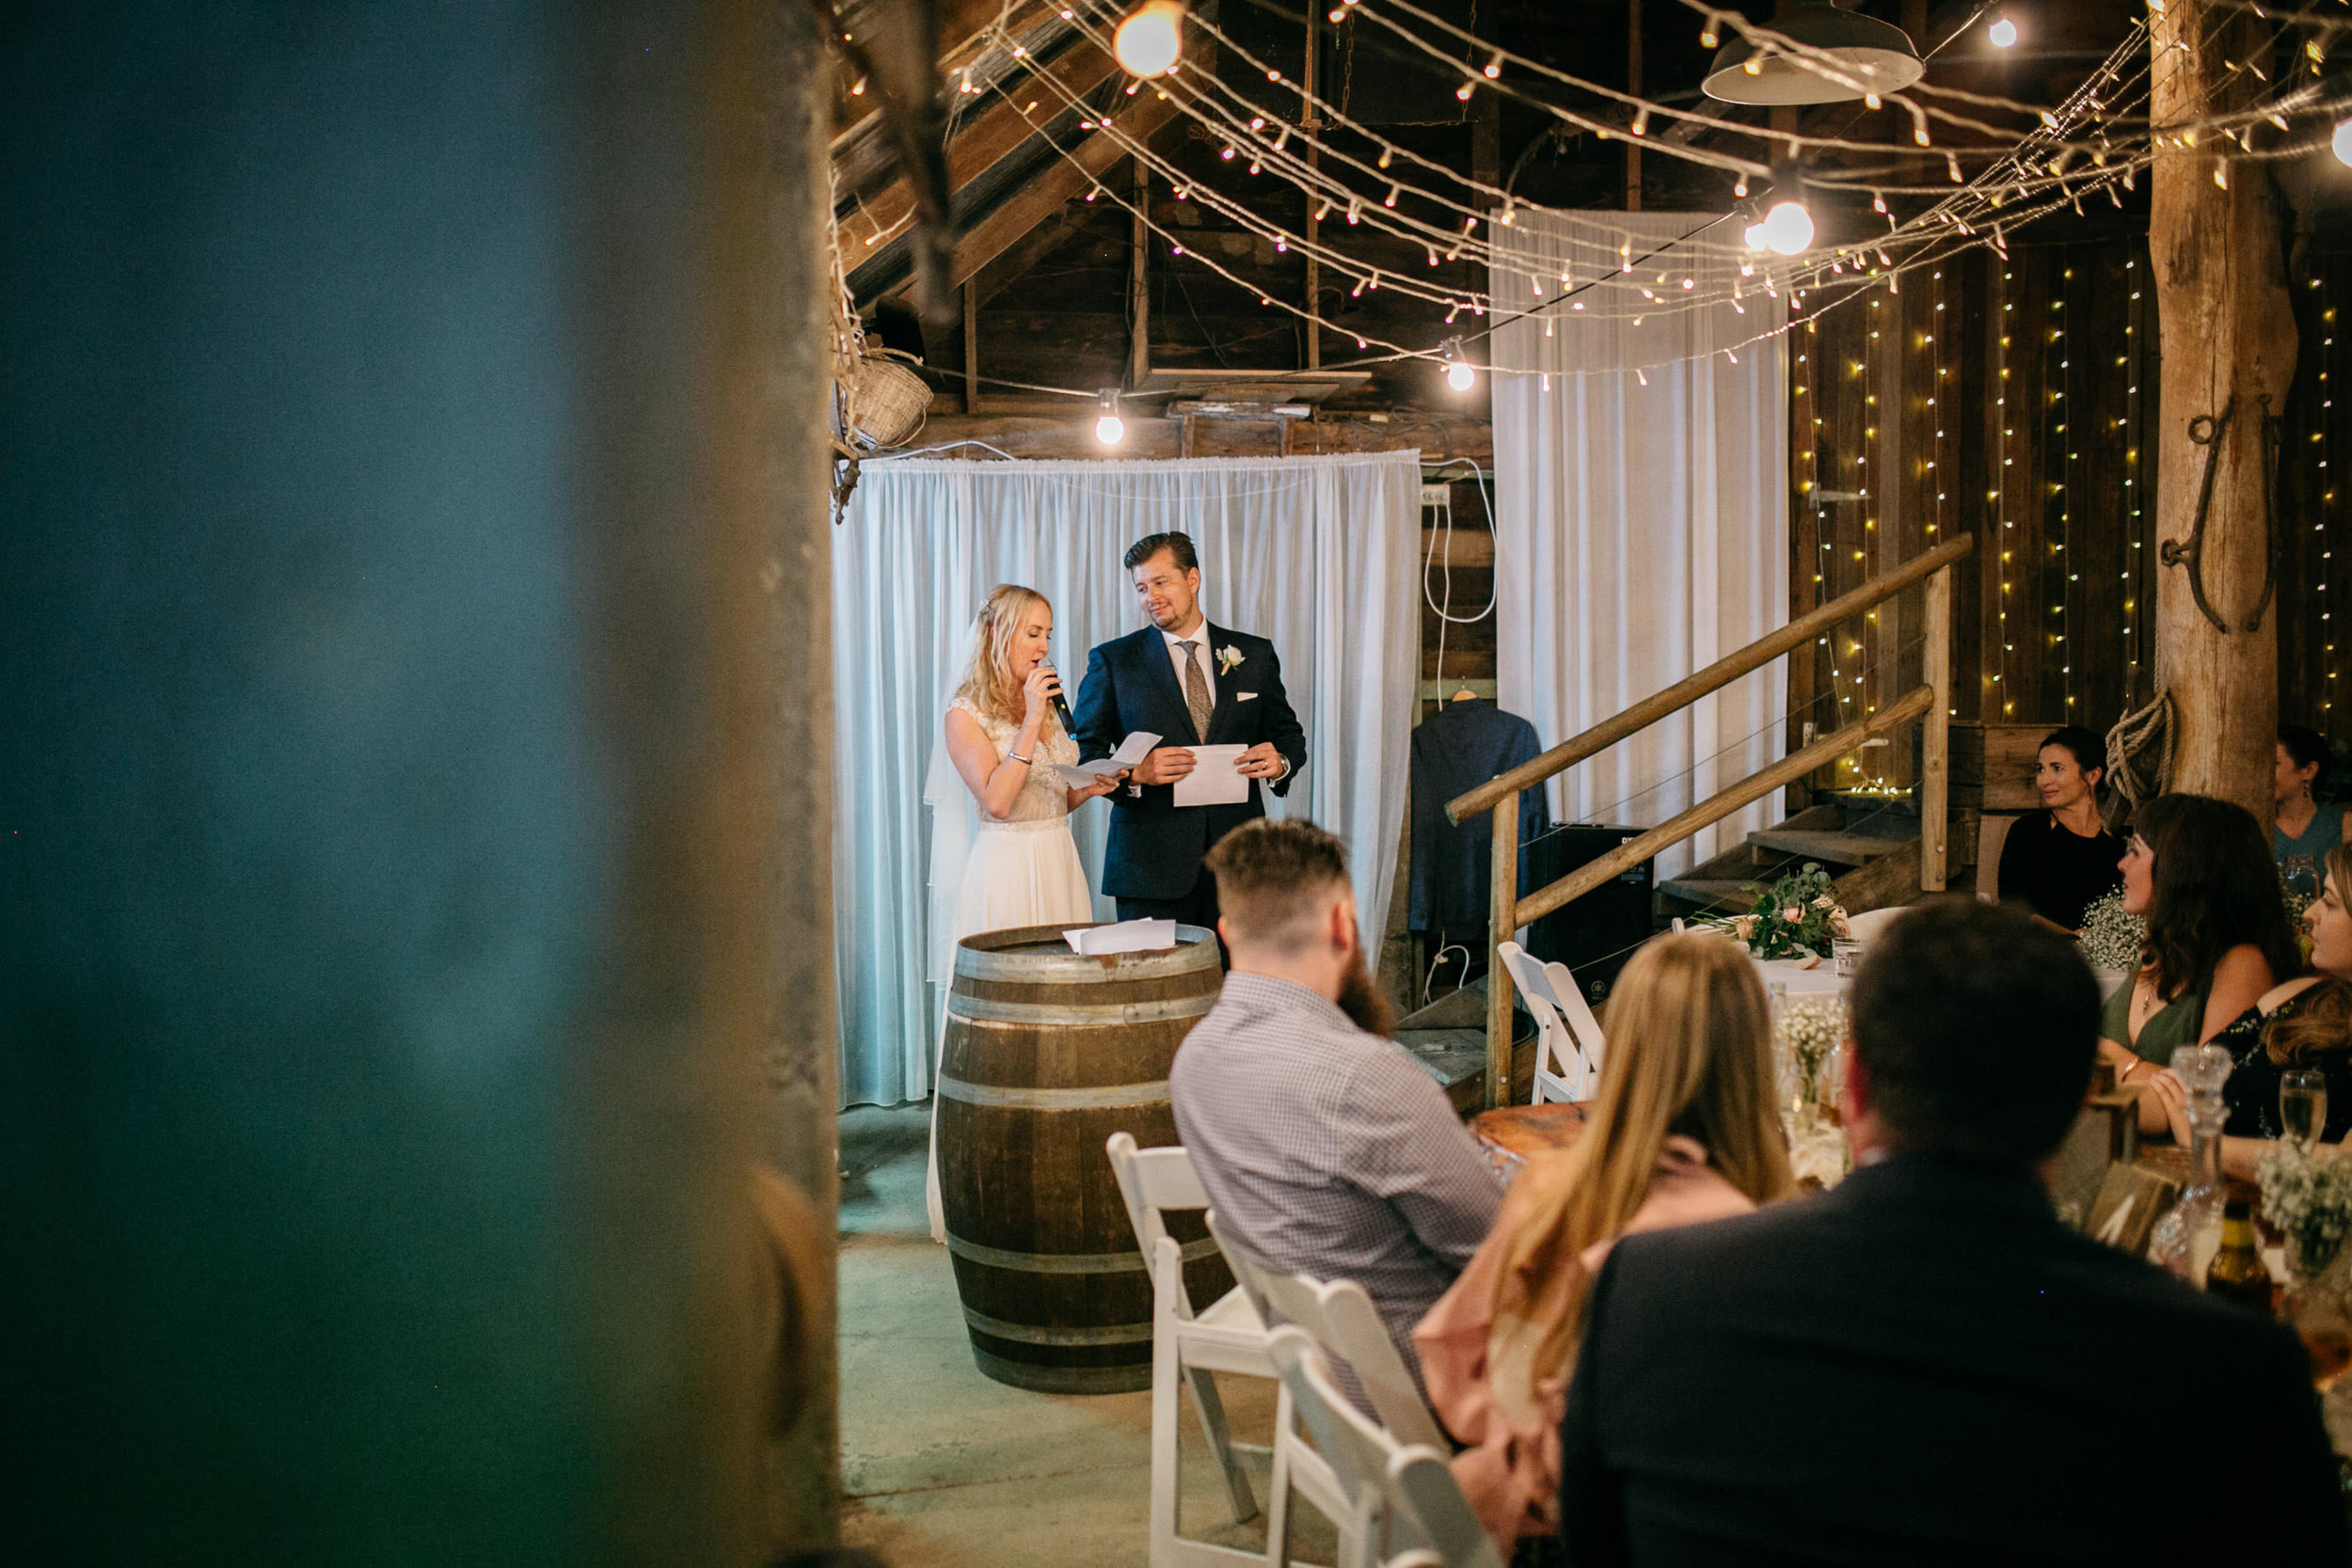 True North Photography_Boomerang Farm_Stacey and Isaac_Gold Coast Wedding_Barm Wedding_Hinterland Wedding-210.jpg